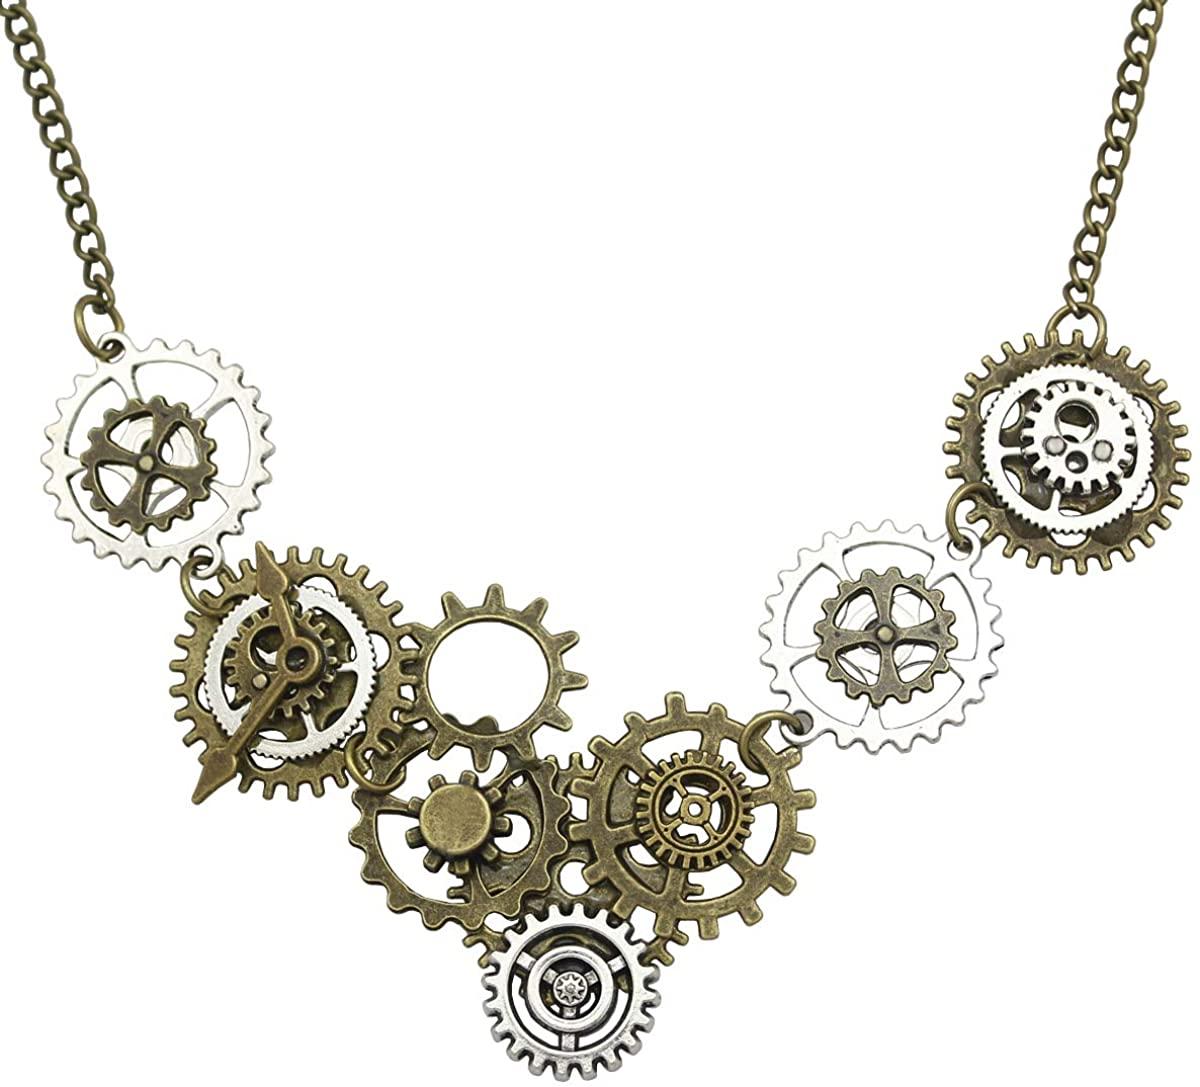 RechicGu Style A Watch Clock Clockwork Hand Gear Cog Steampunk Necklace Vintage Gold and Silver